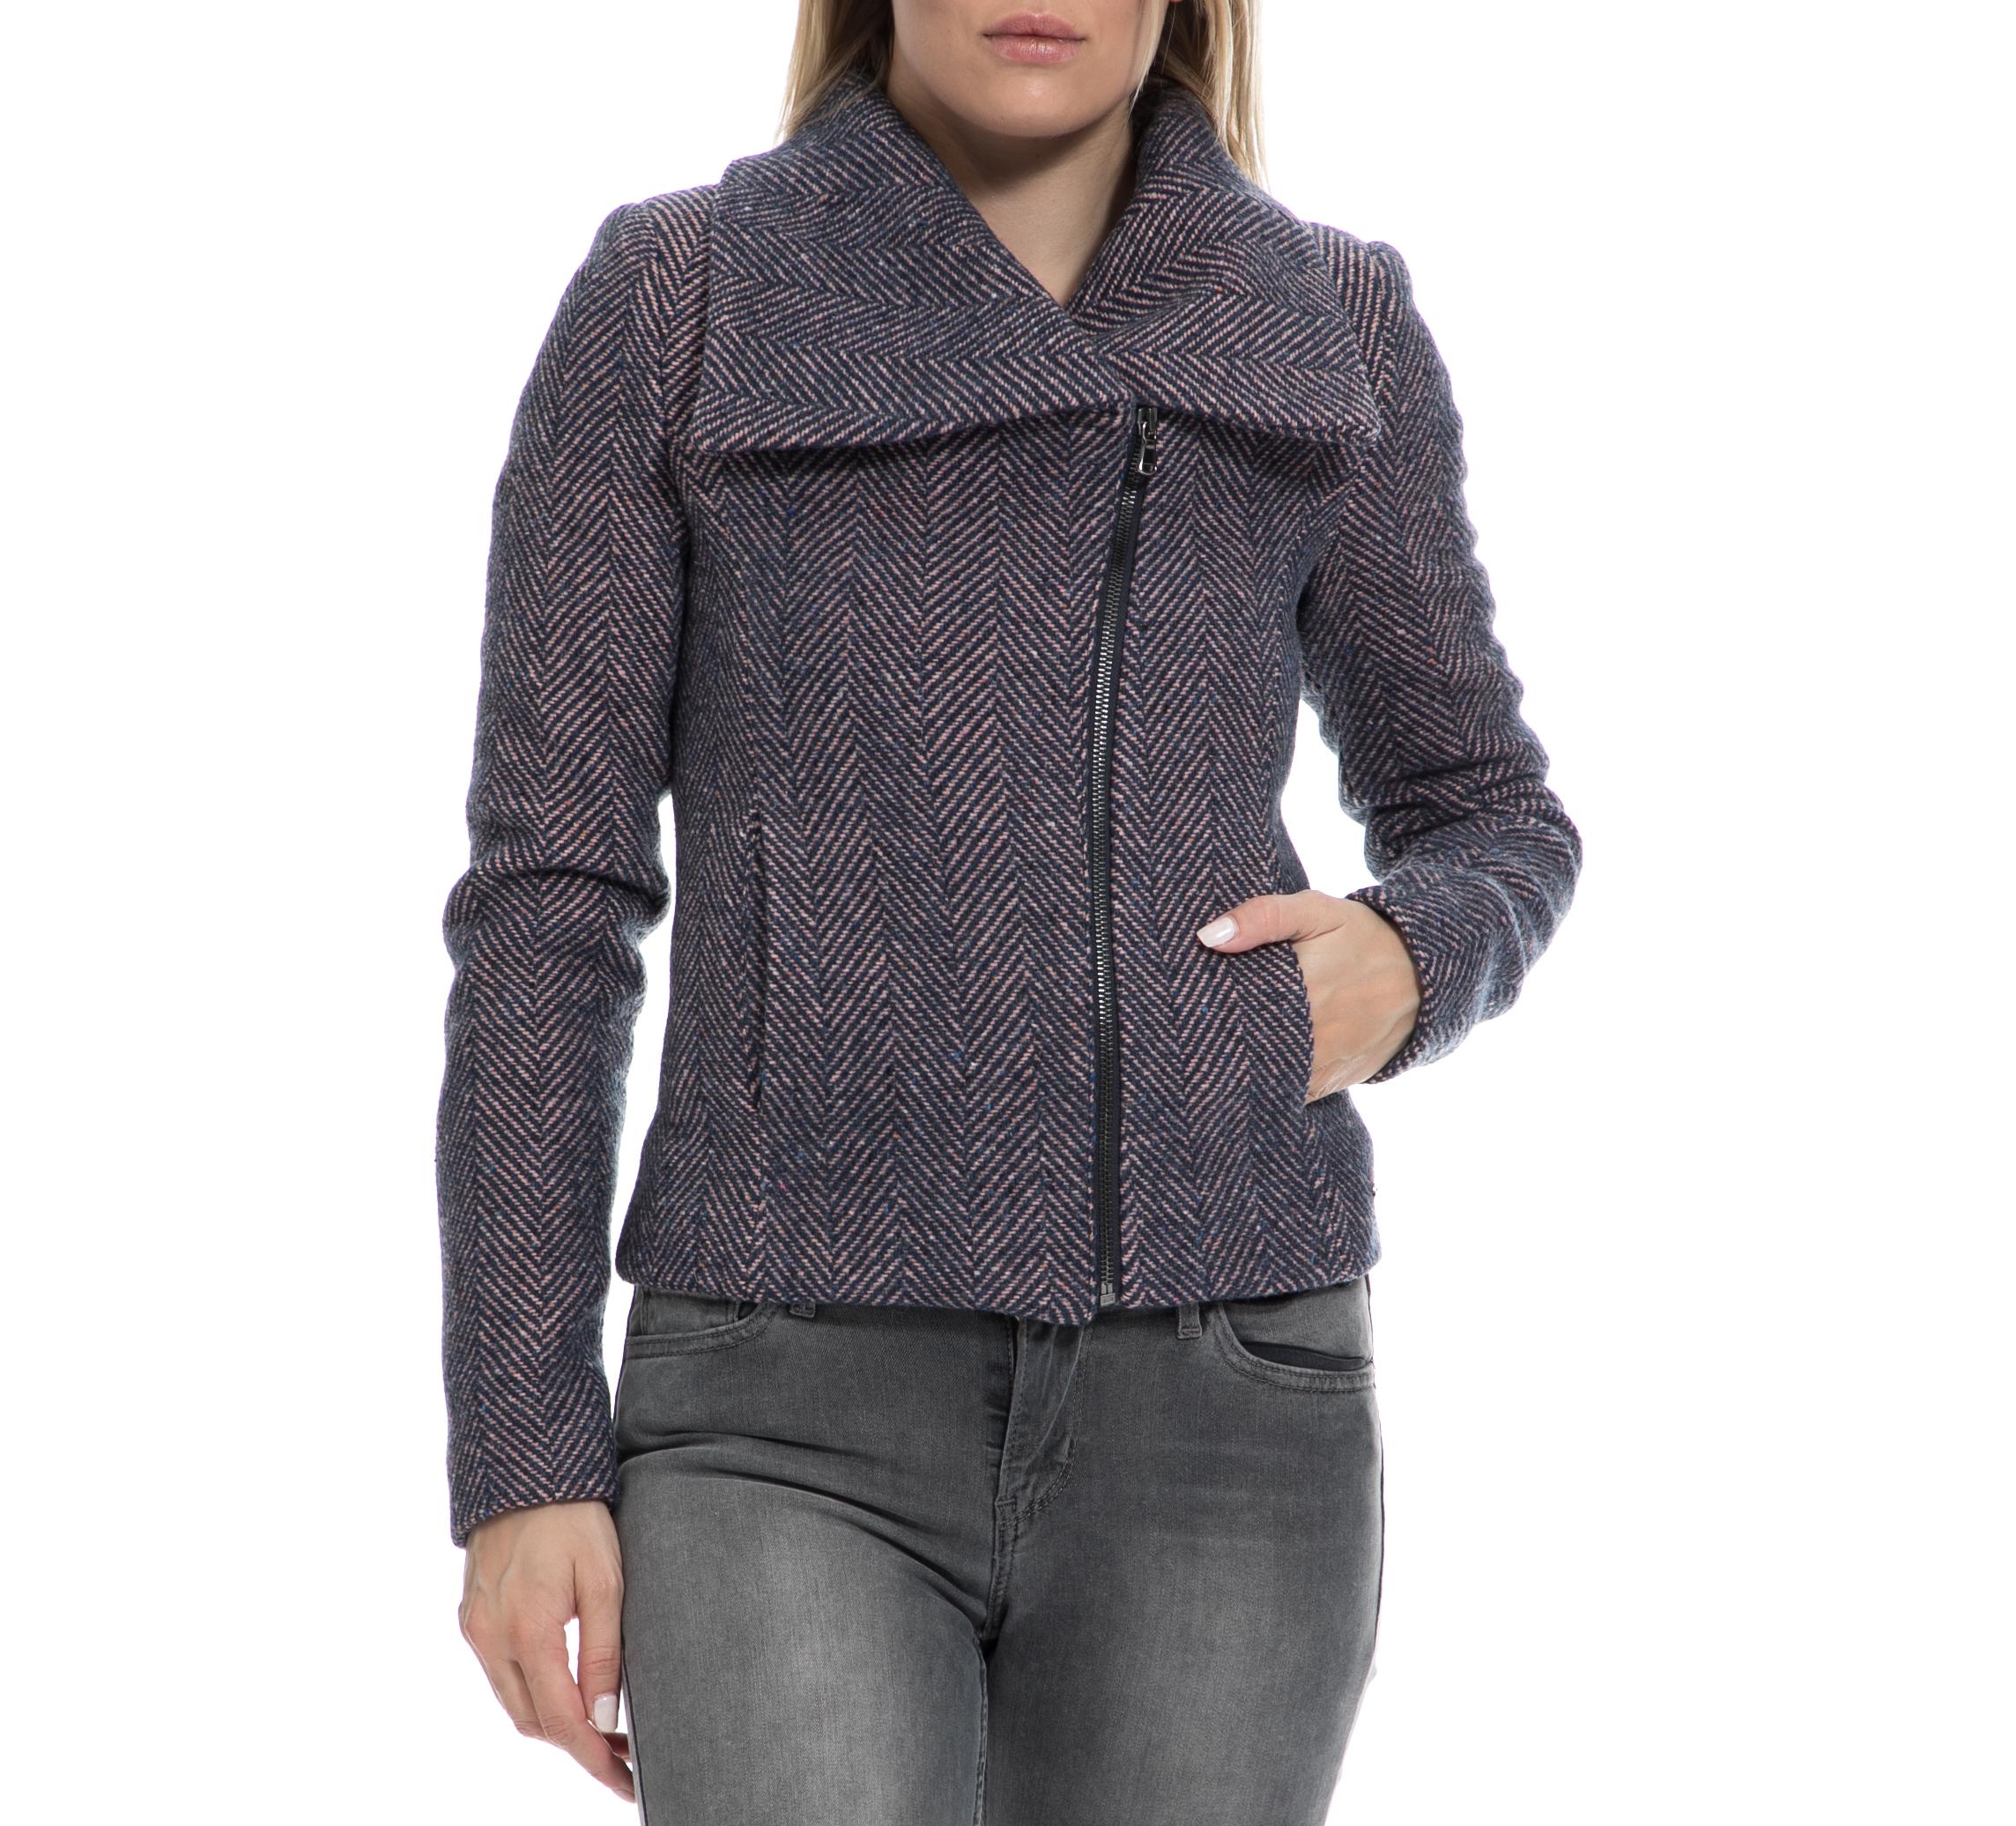 DENNY ROSE – Γυναικείο παλτό DENNY ROSE μοβ